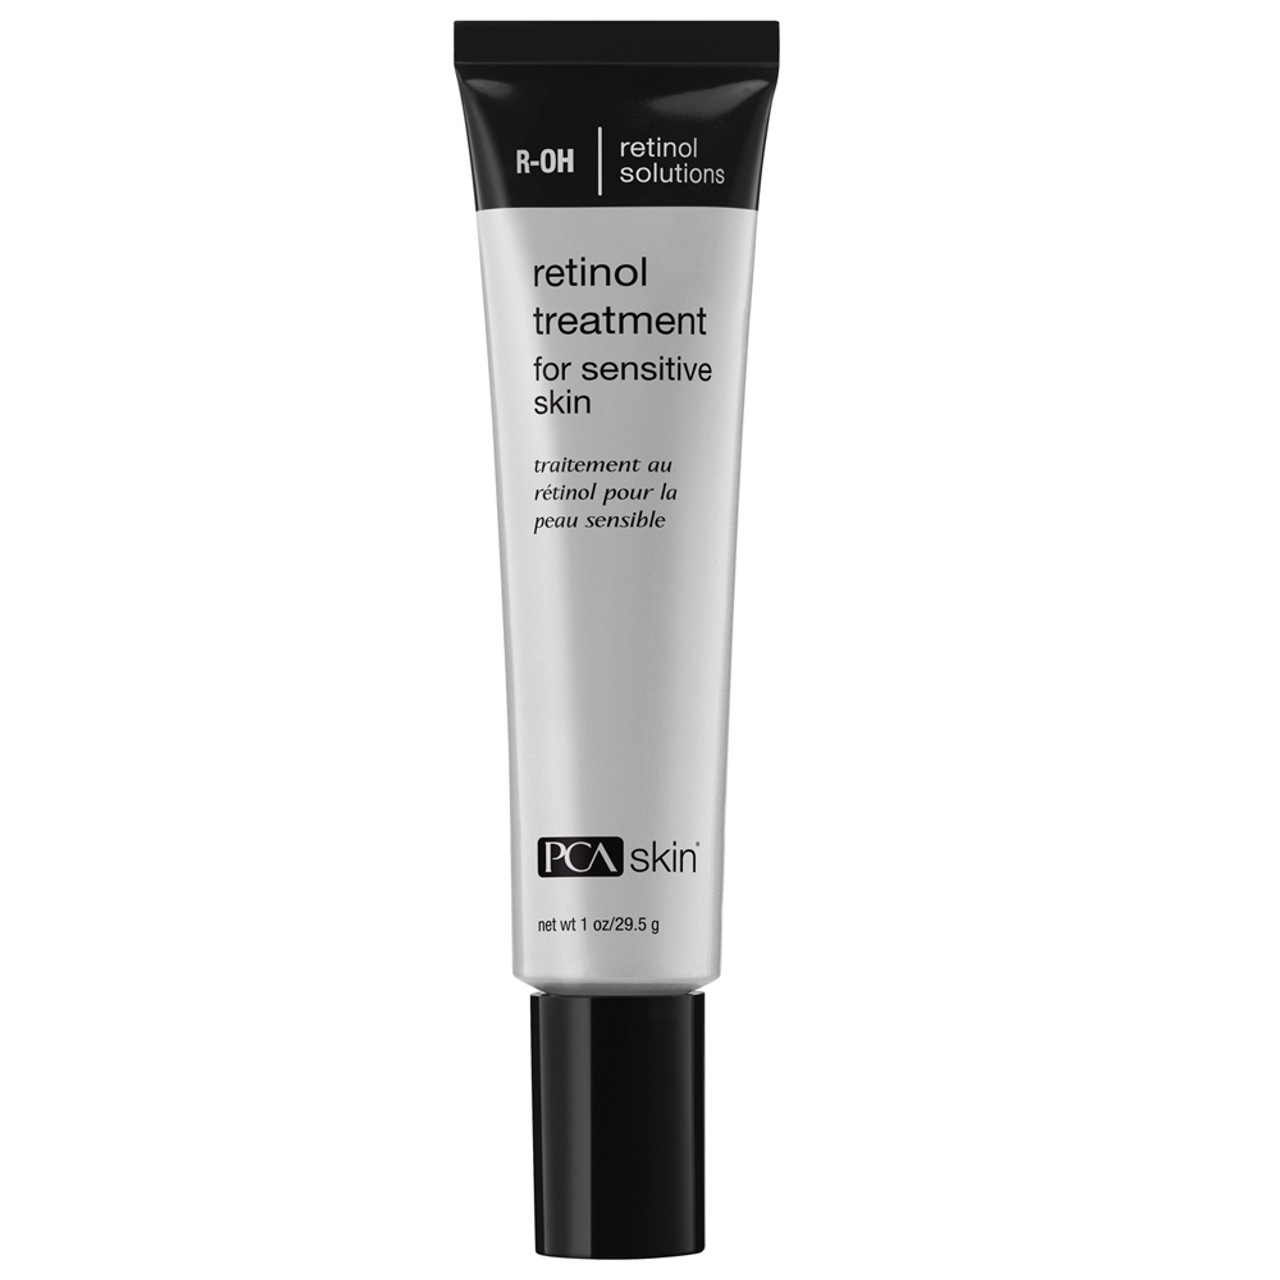 PCA Skin Retinol Treatment for Sensitive Skin BeautifiedYou.com